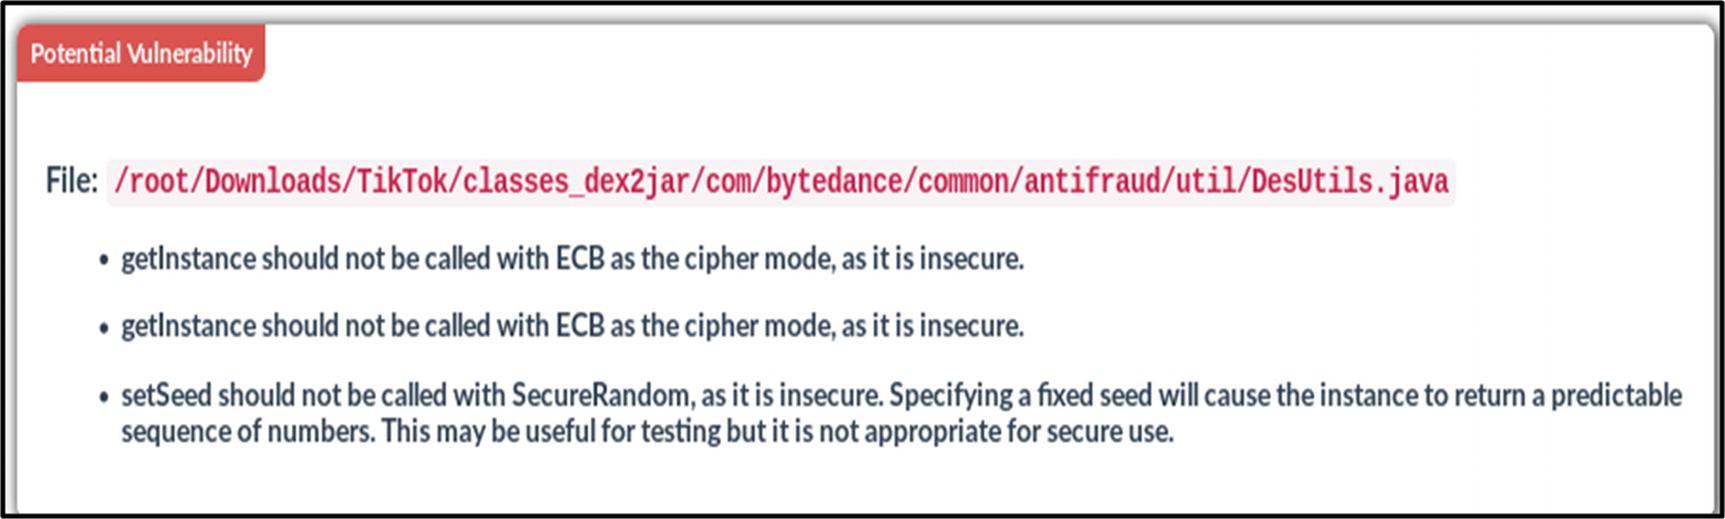 Malware Forensics | SpringerLink